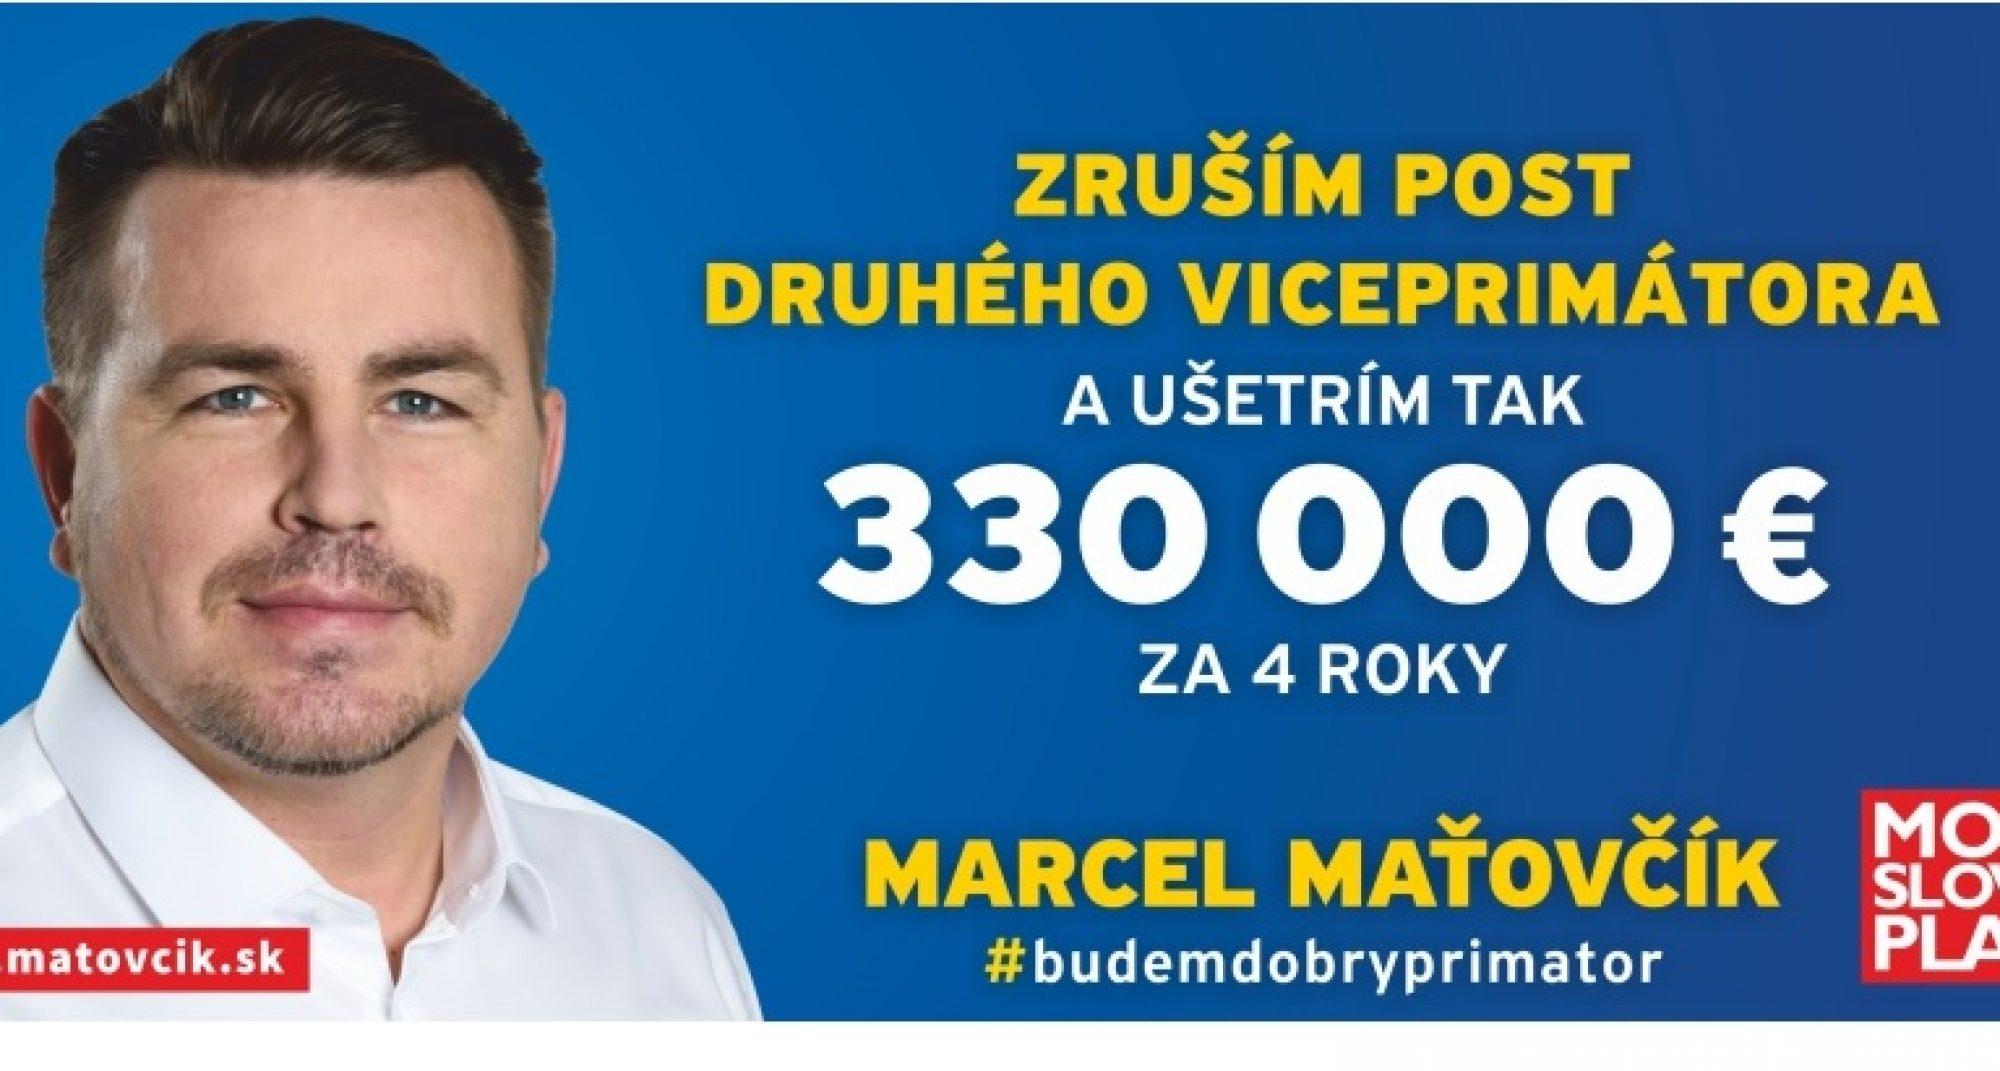 www.matovcik.sk